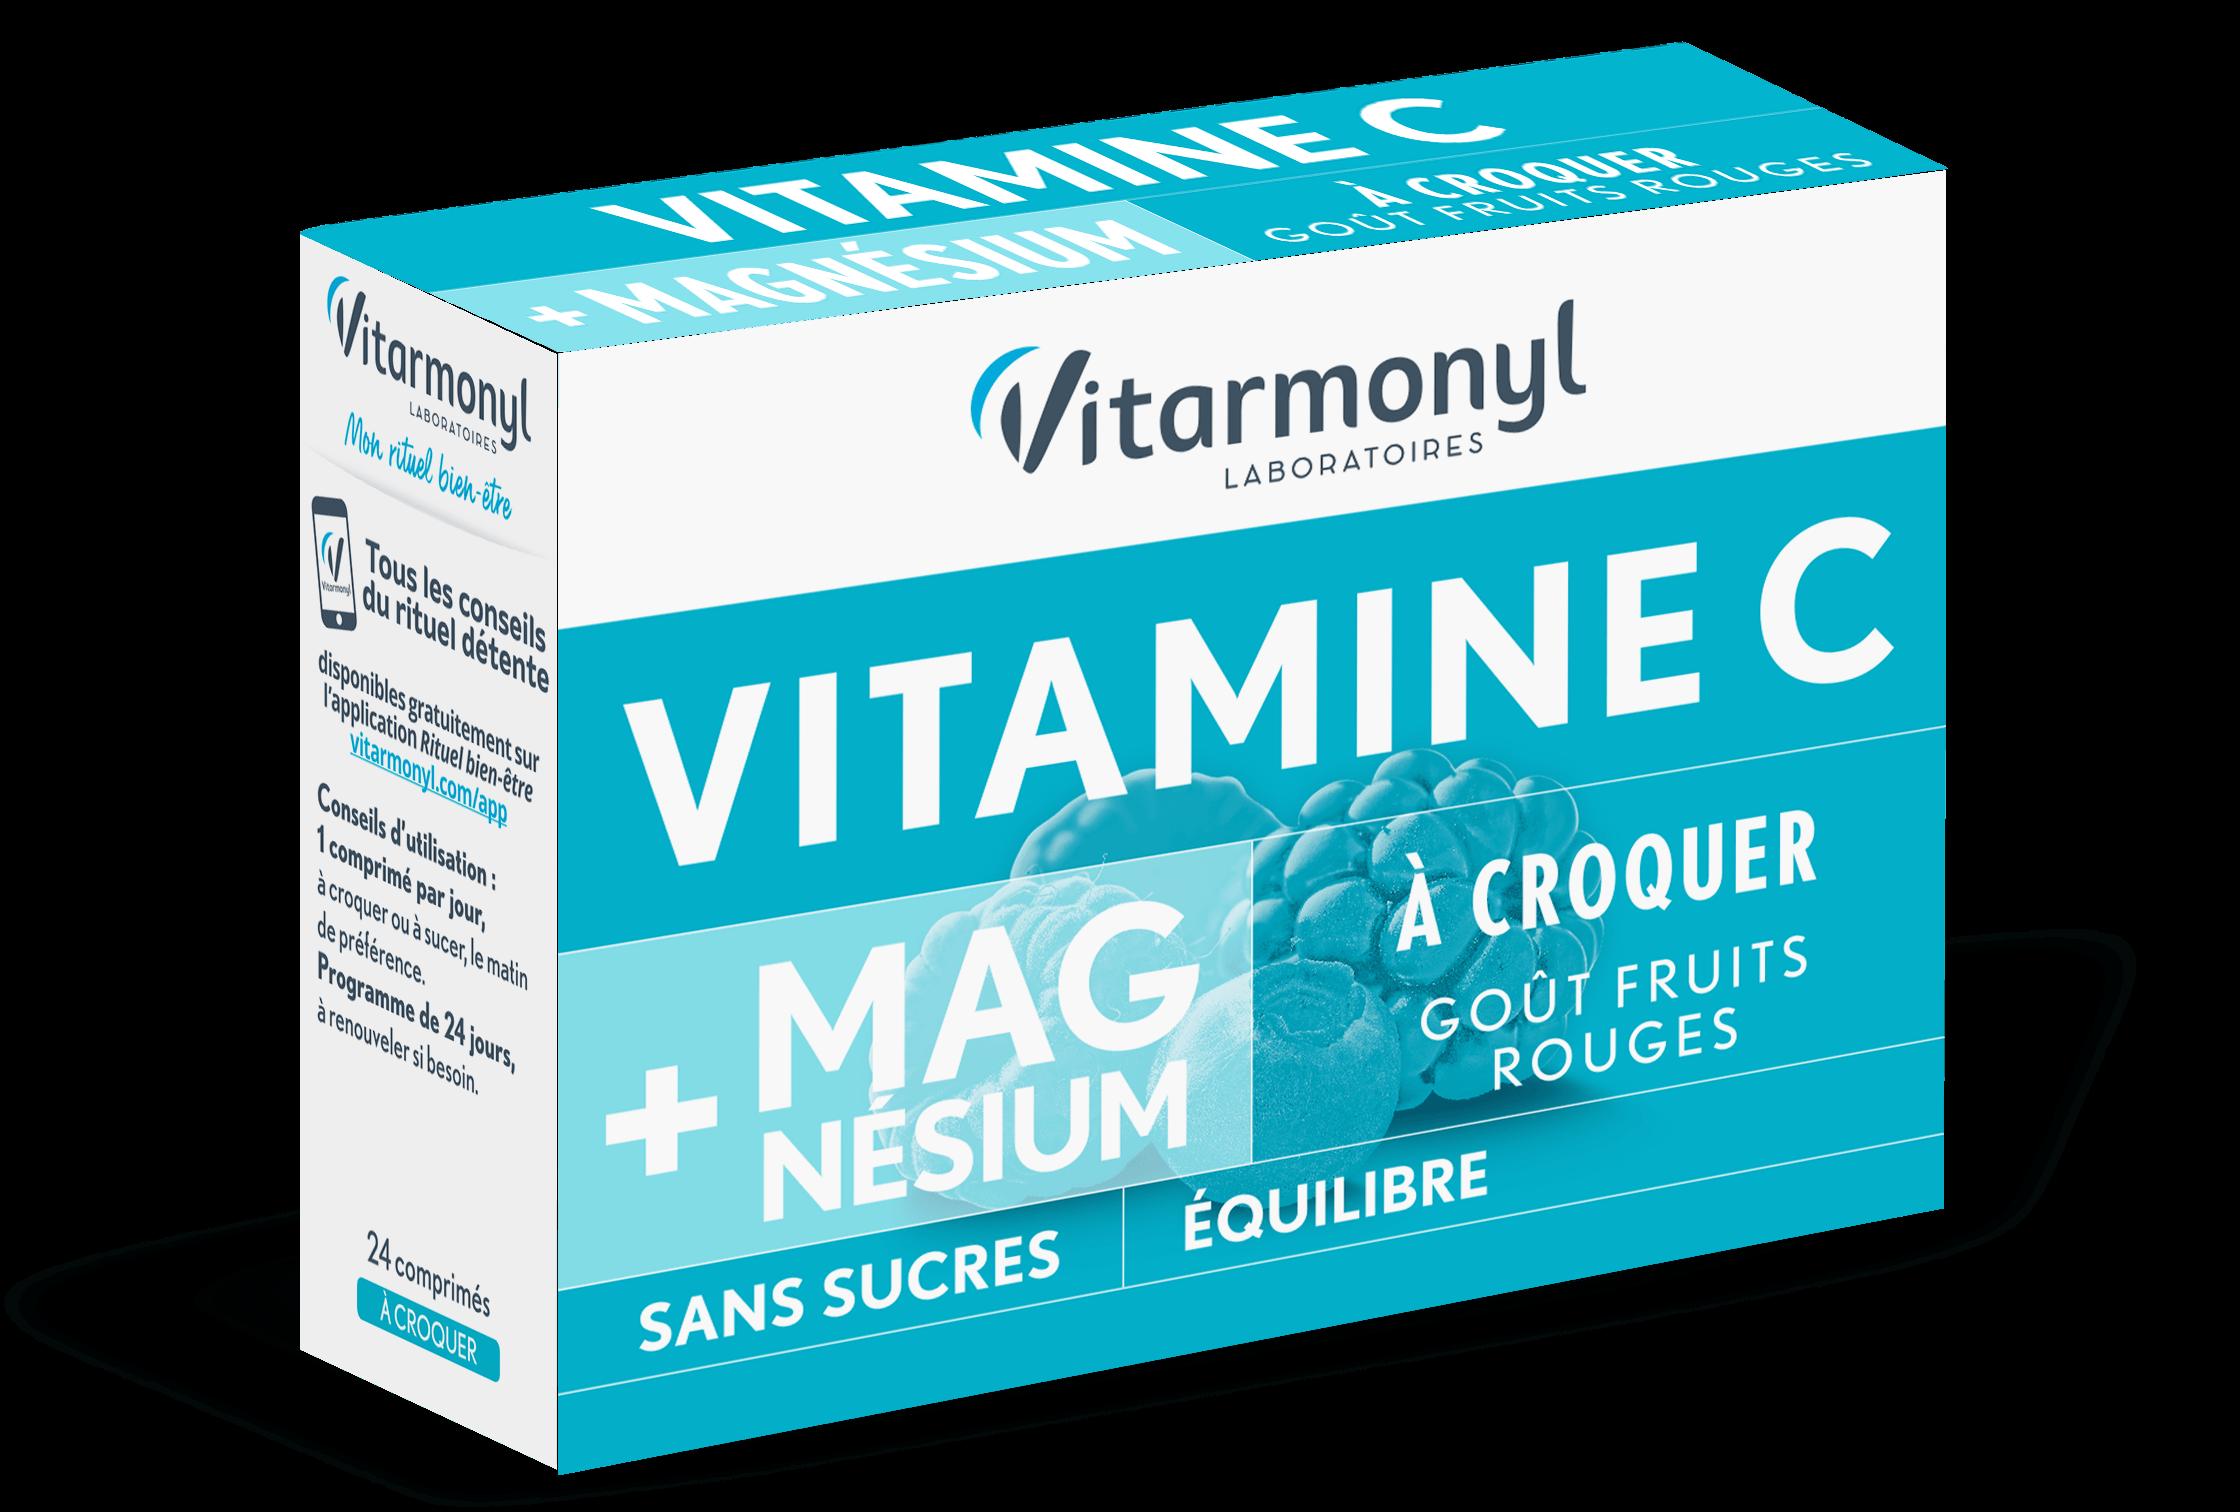 Image Vitamine C – Magnésium